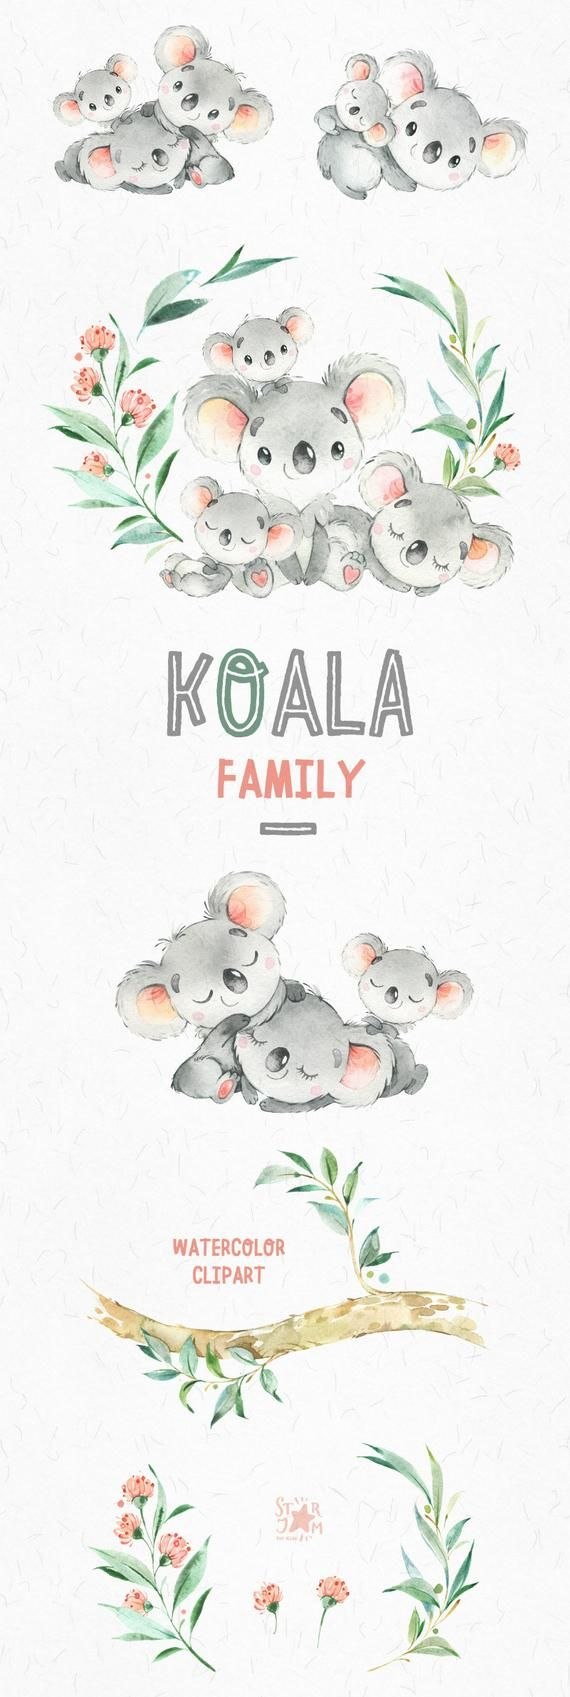 Koala-Familie. Kleine Tiere Aquarell Clipart, Australien, Koalabären, Aquarell, Blumen, Babyshower, diy, Kinder, Baby, Kinderzimmer, Liebe